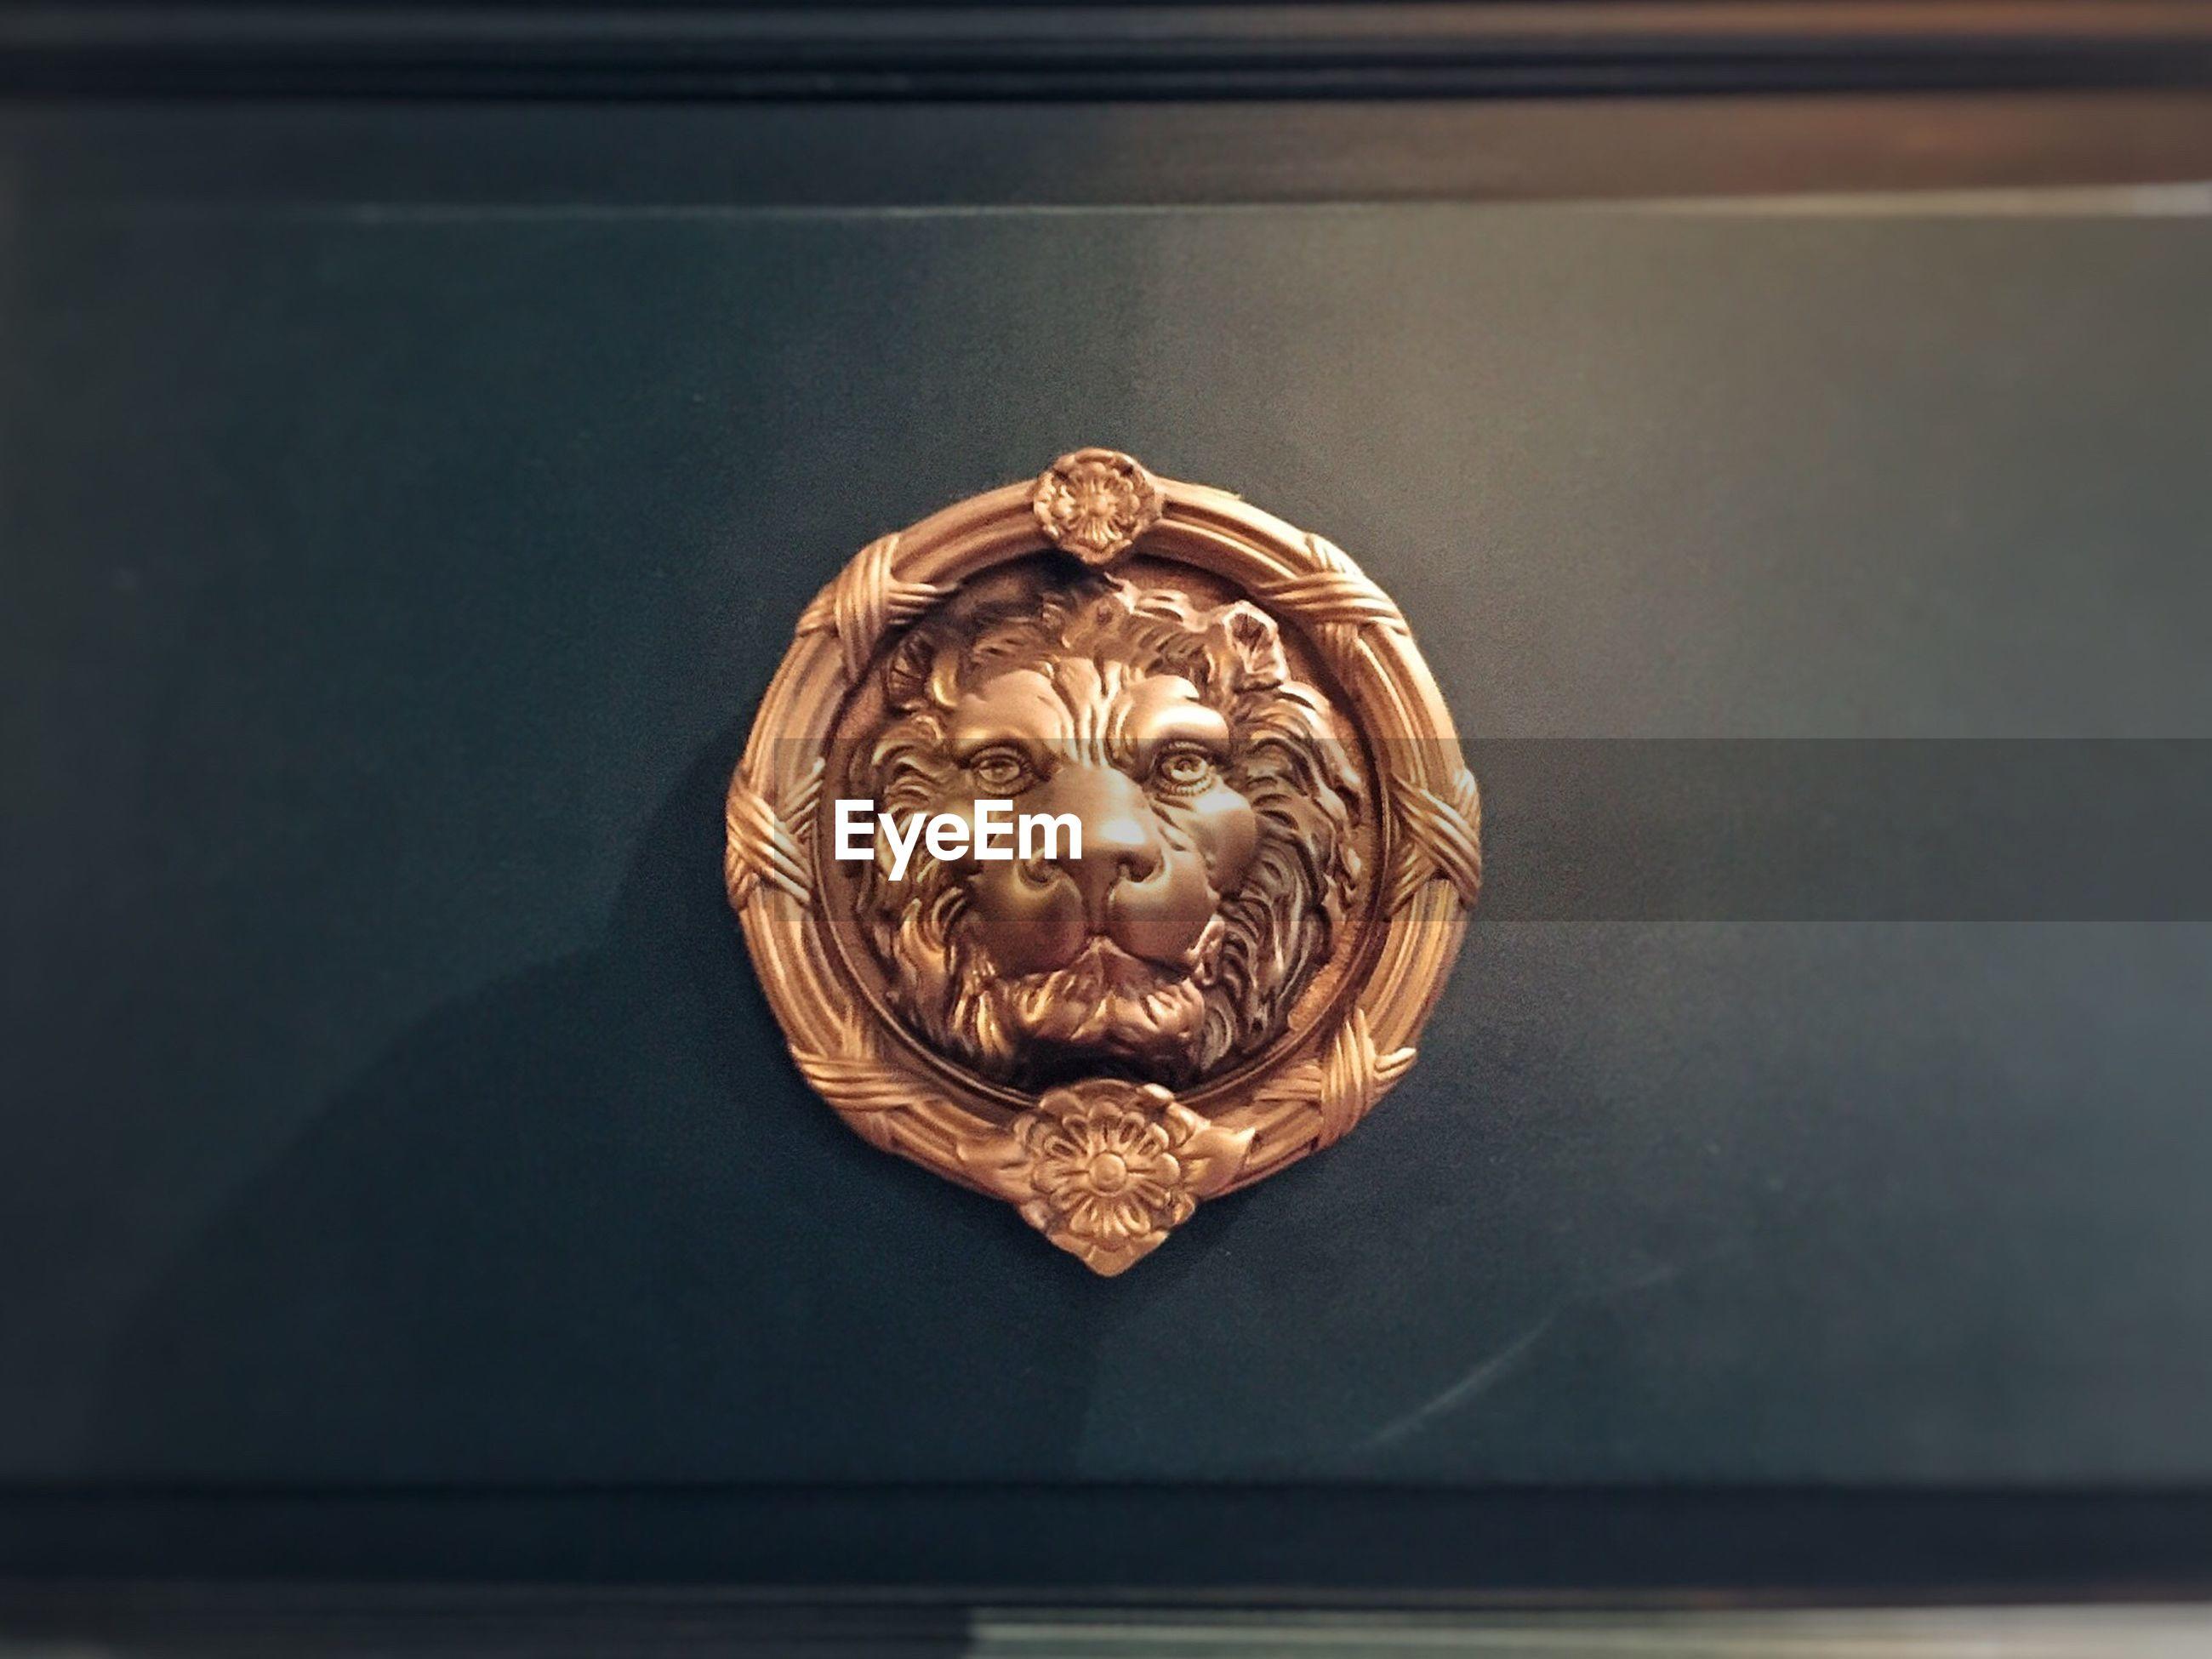 CLOSE-UP VIEW OF HUMAN EYE